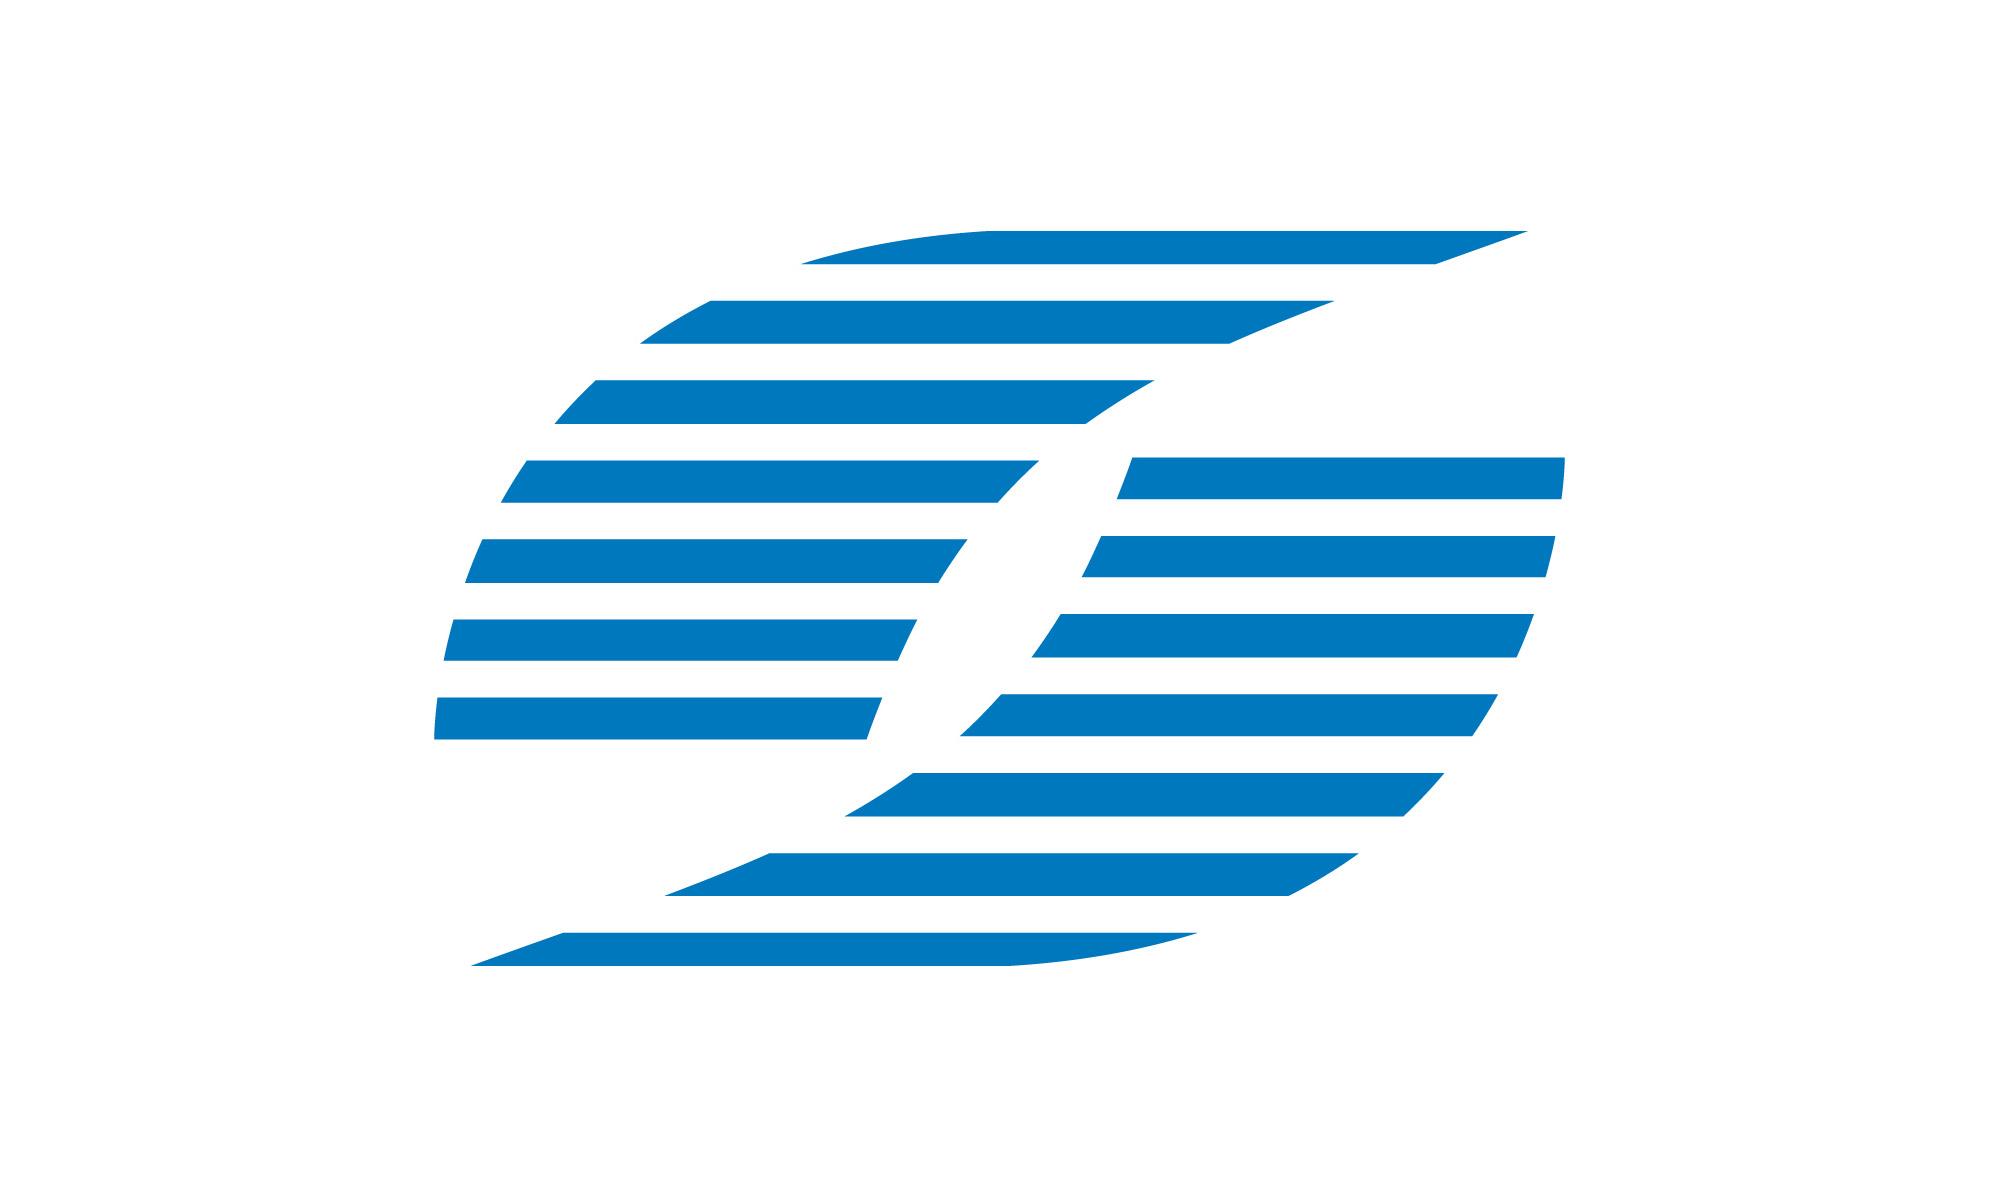 GIEAG - Gewerbe Immobilien Entwicklungs AG München